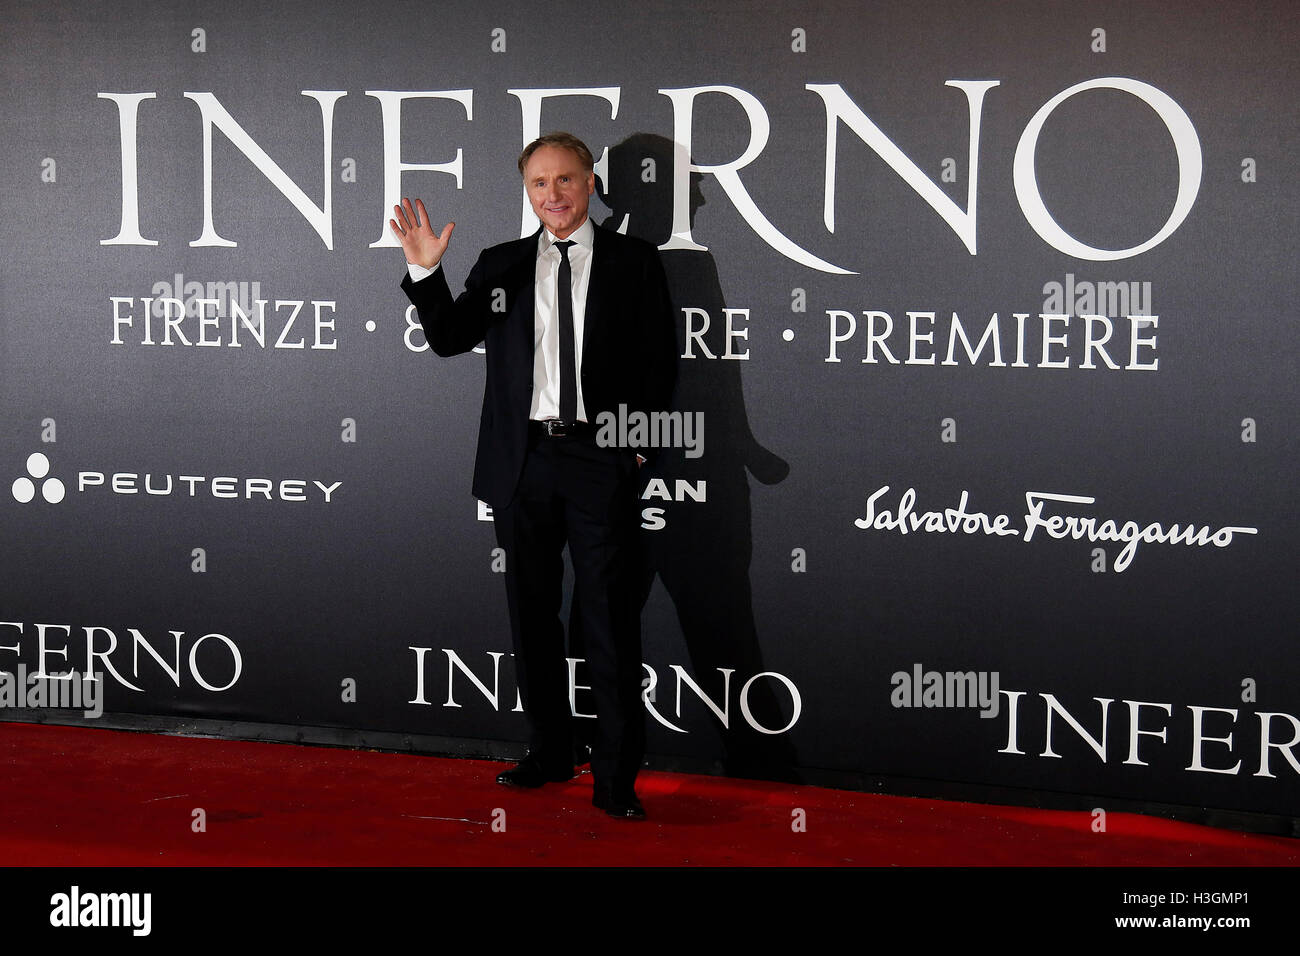 "Florenz, Italien. 8. Oktober 2016. Dan Brown Florenz 8. Oktober 2016. ""Inferno"" Welt-Premiere. Foto Samantha Stockbild"